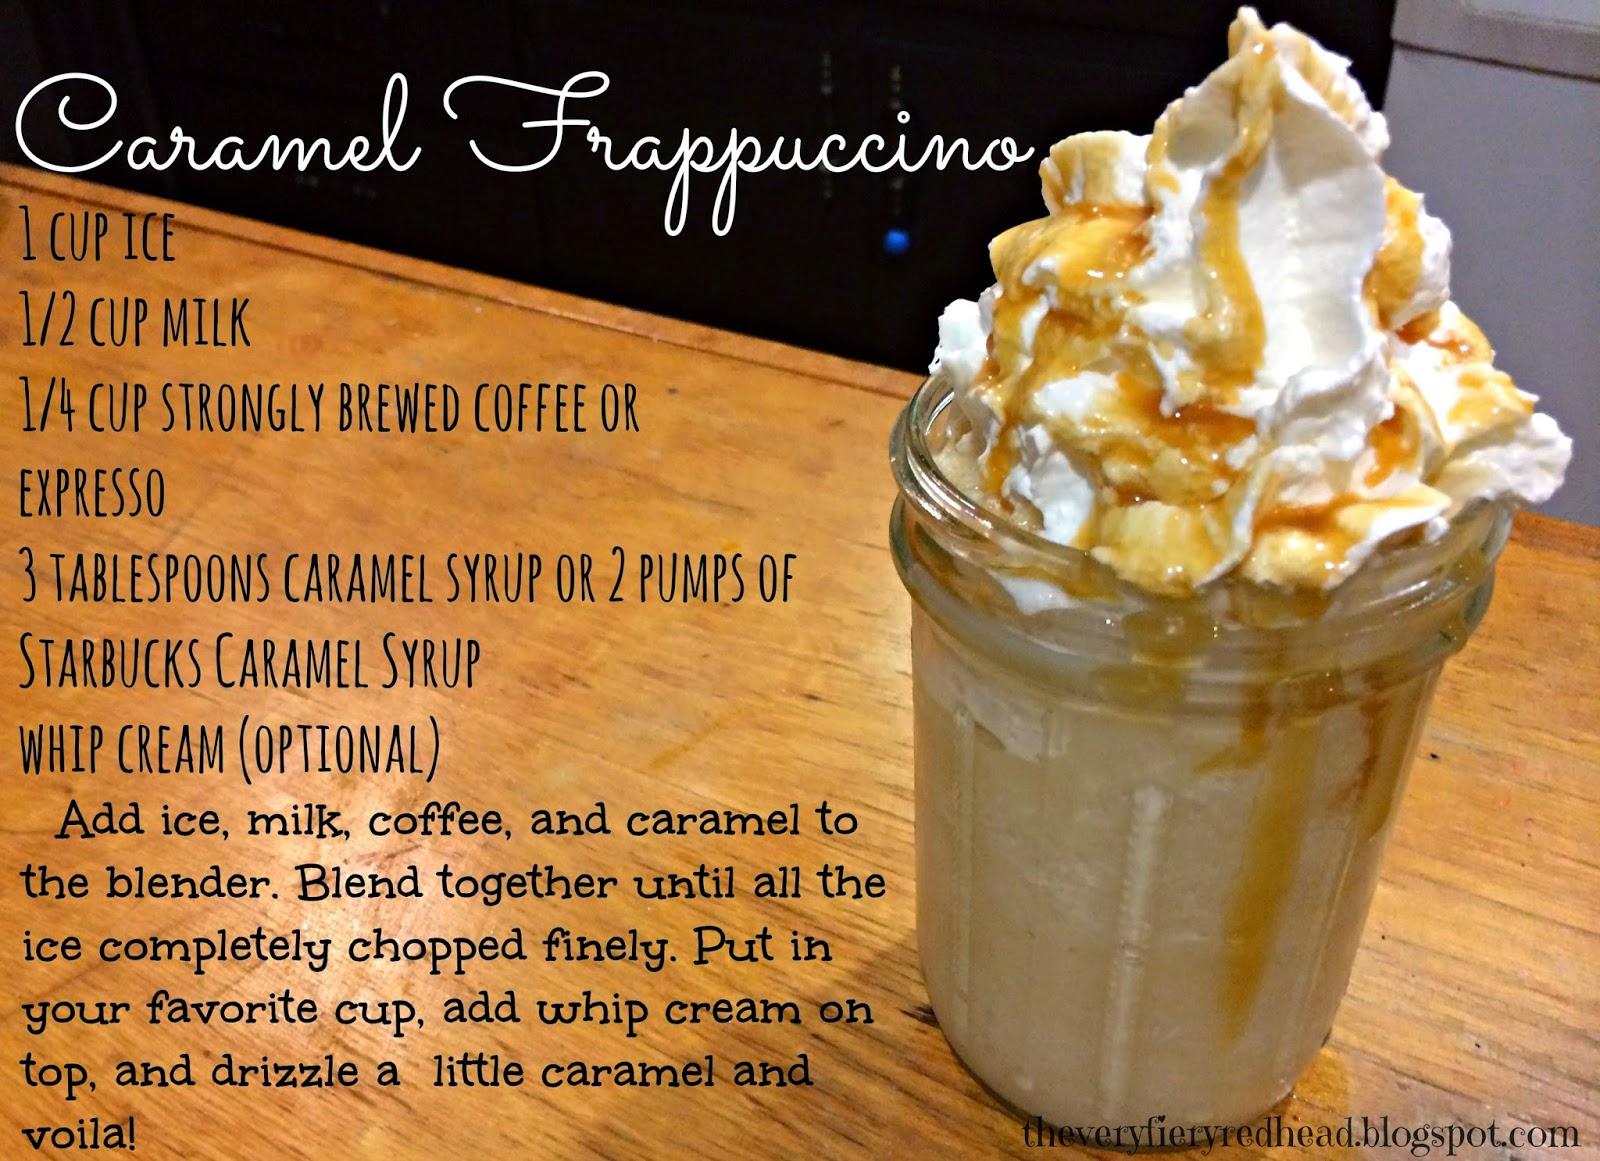 Make Starbucks Caramel Frappuccino At Home